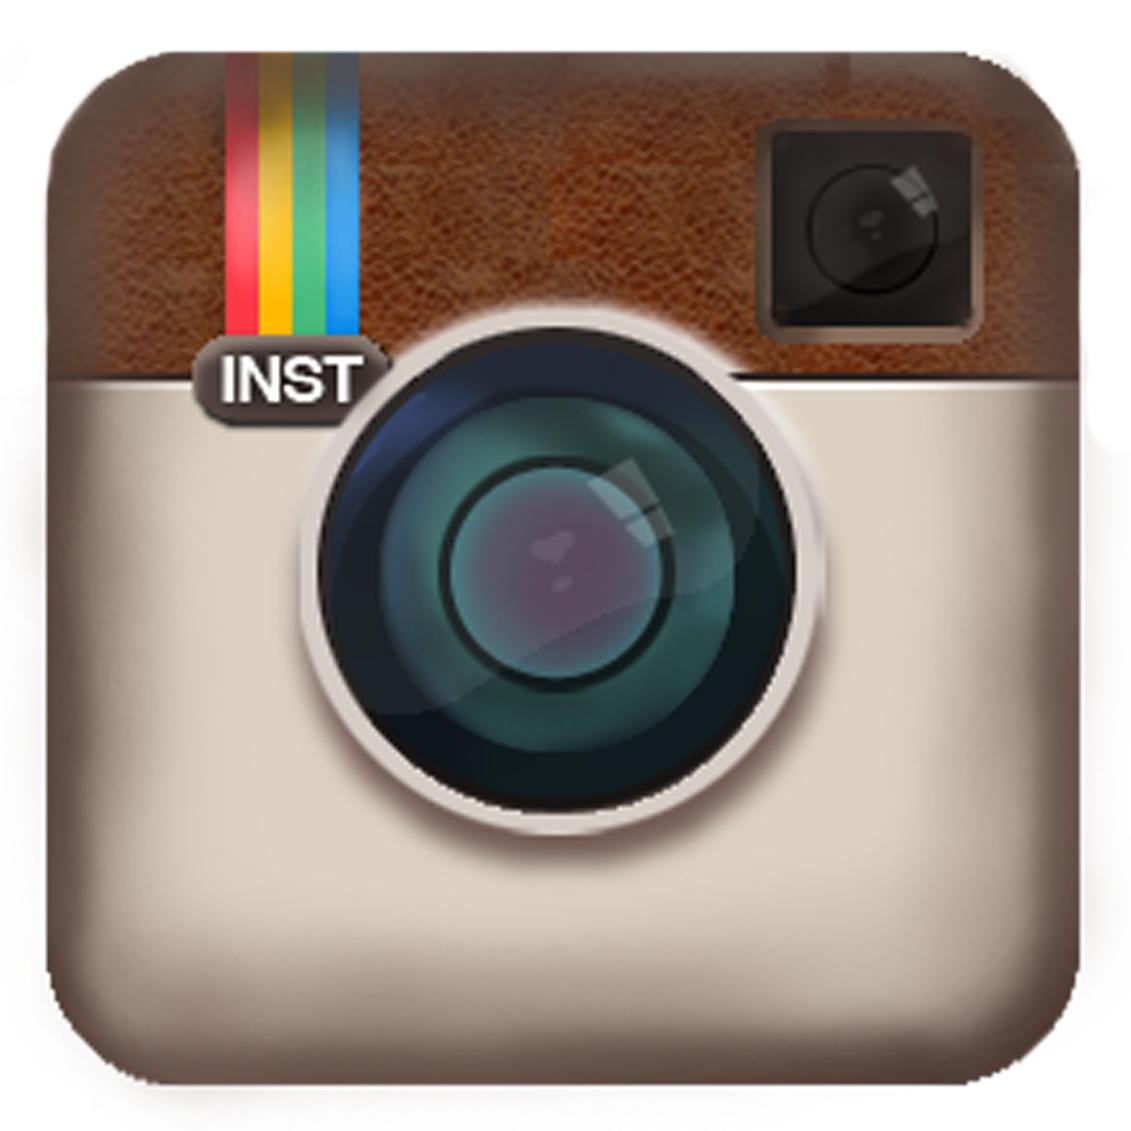 seg n wikipedia instagram es una aplicaci n gratuita para